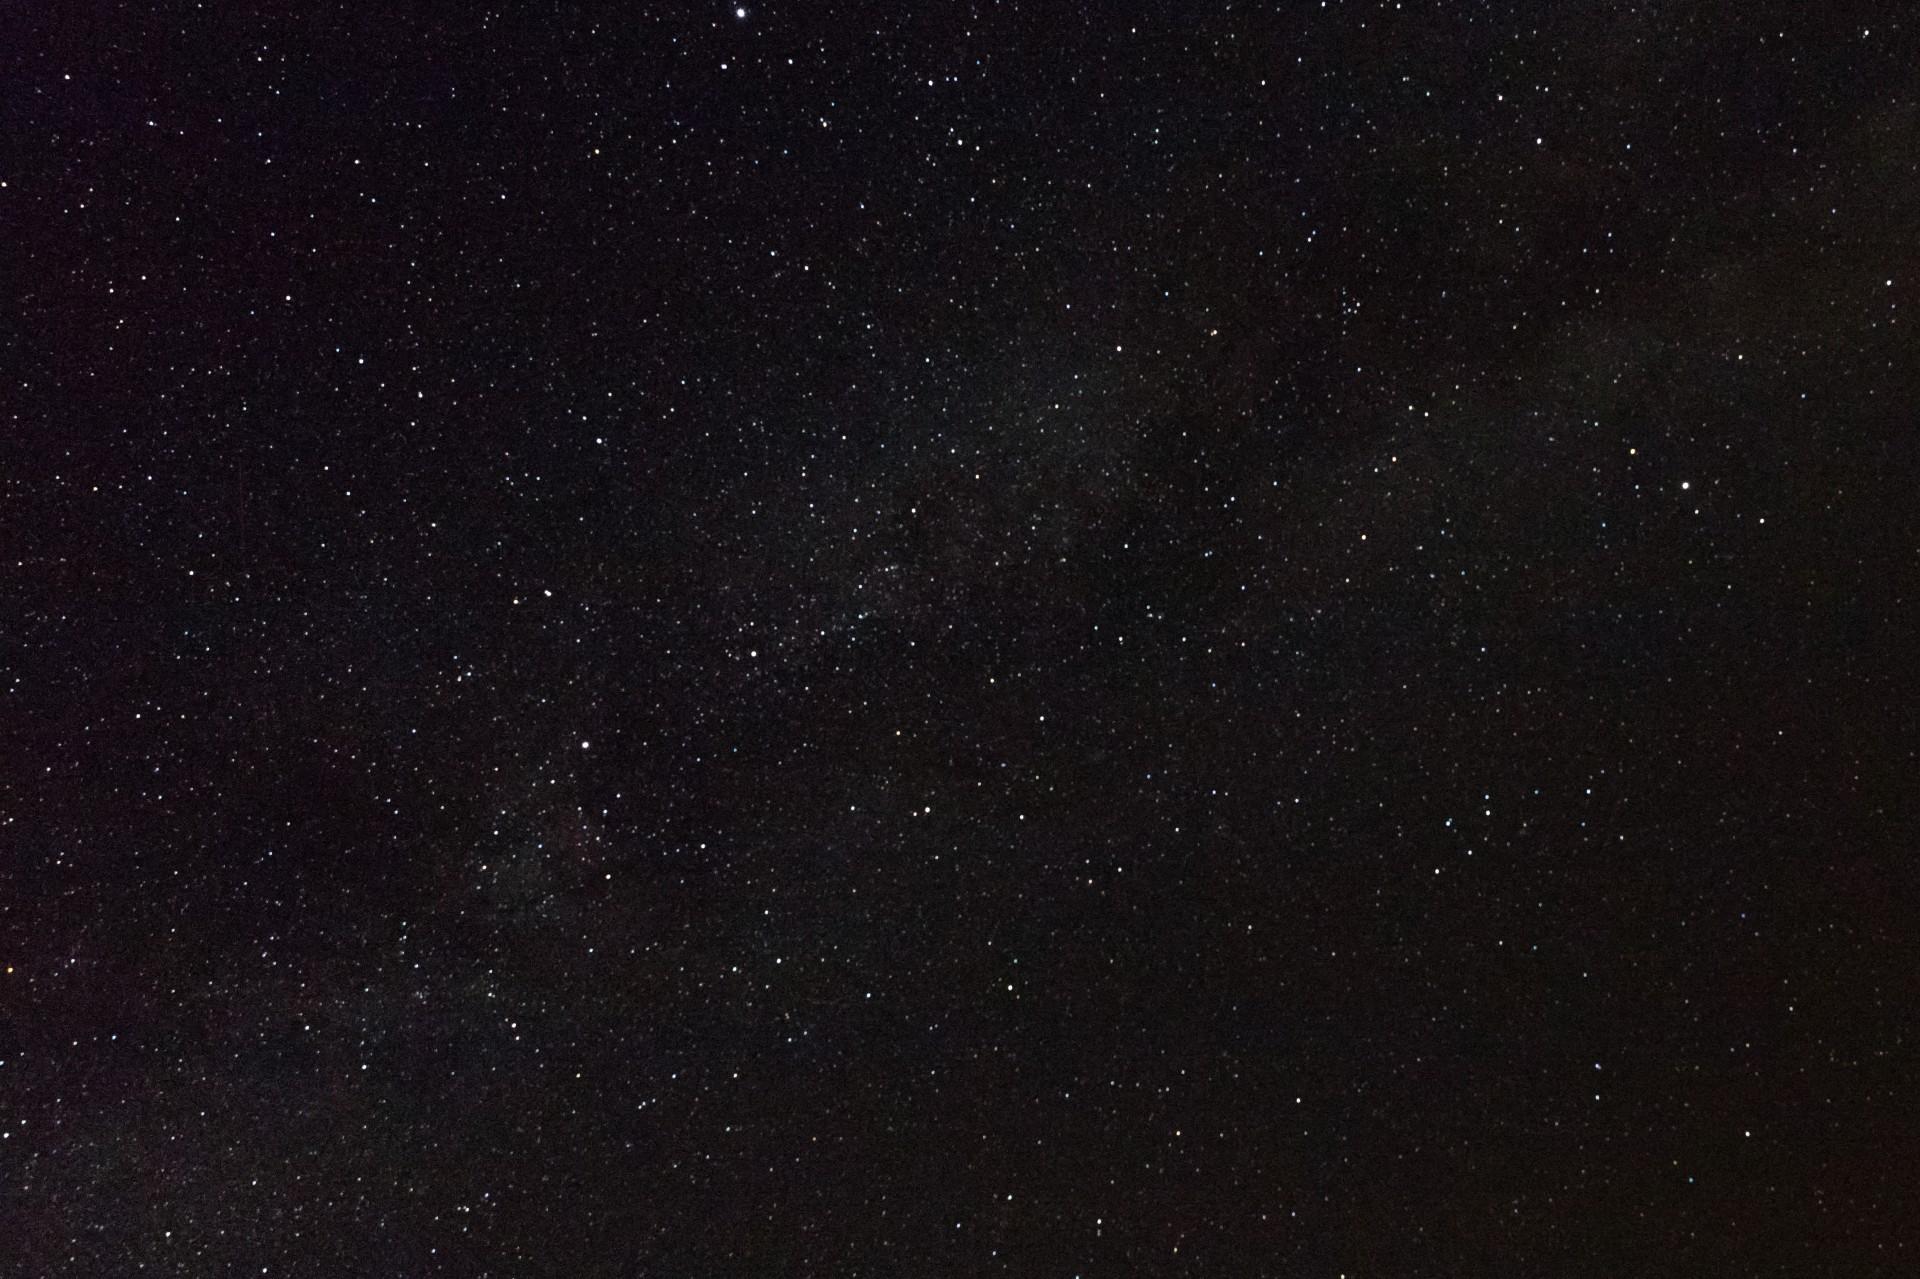 Astronomy clipart night sky. Background free stock photo